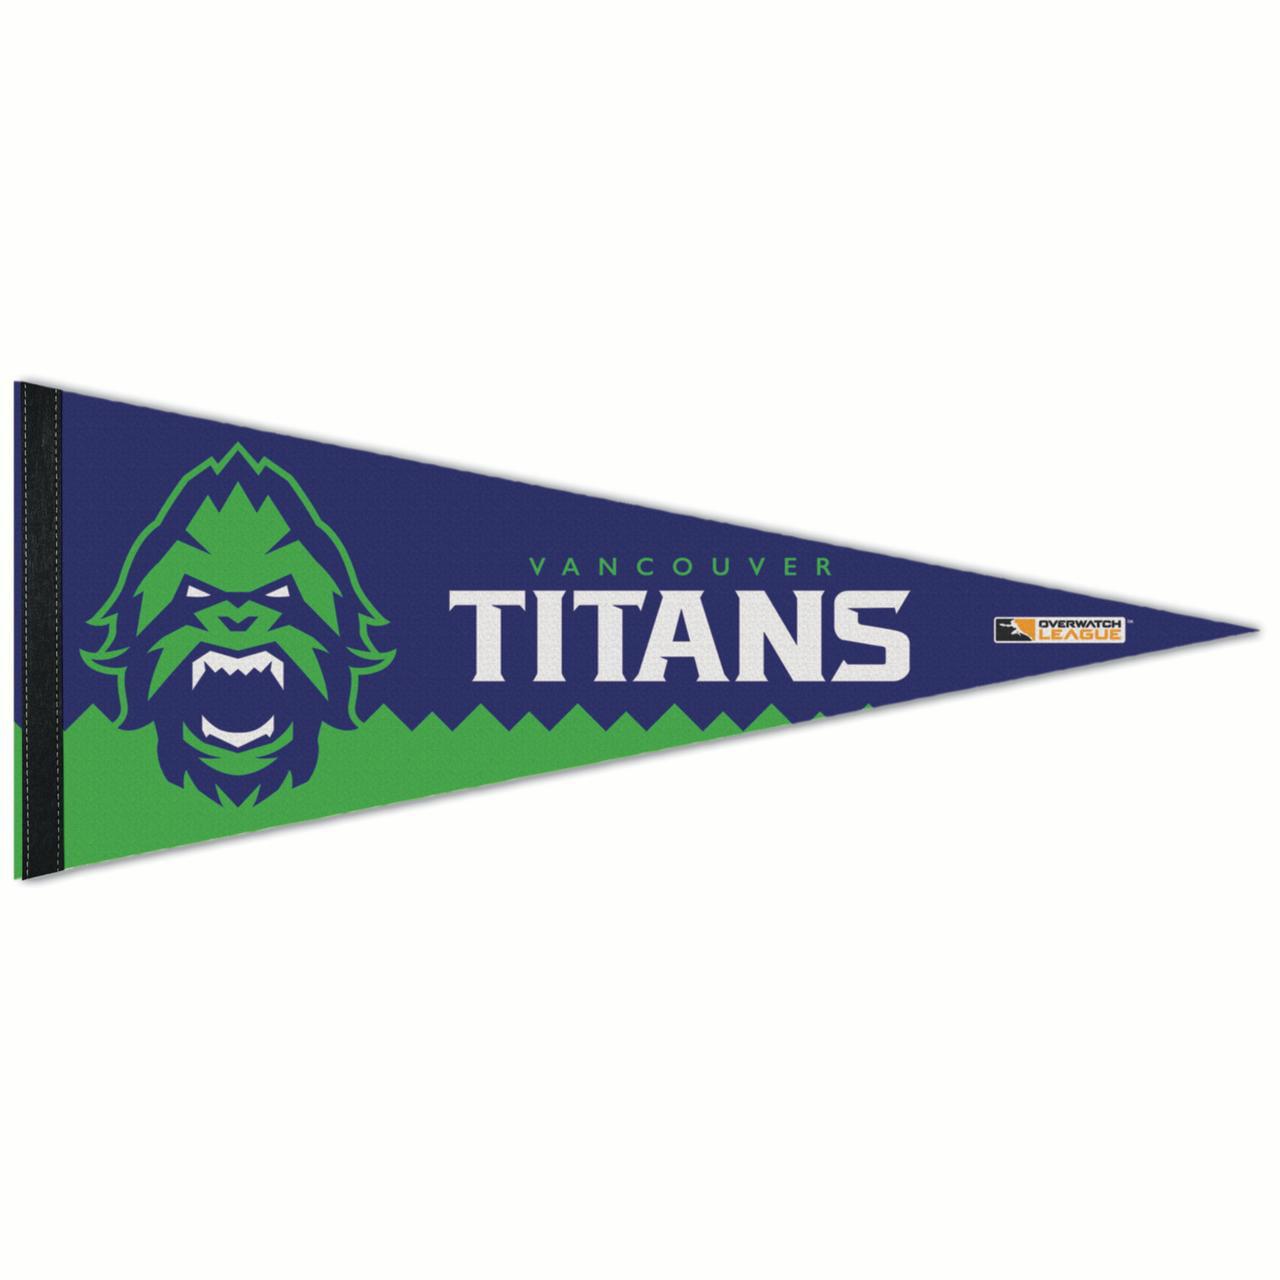 "Vancouver Titans WinCraft 12"" x 30"" Premium Pennant - No Size"